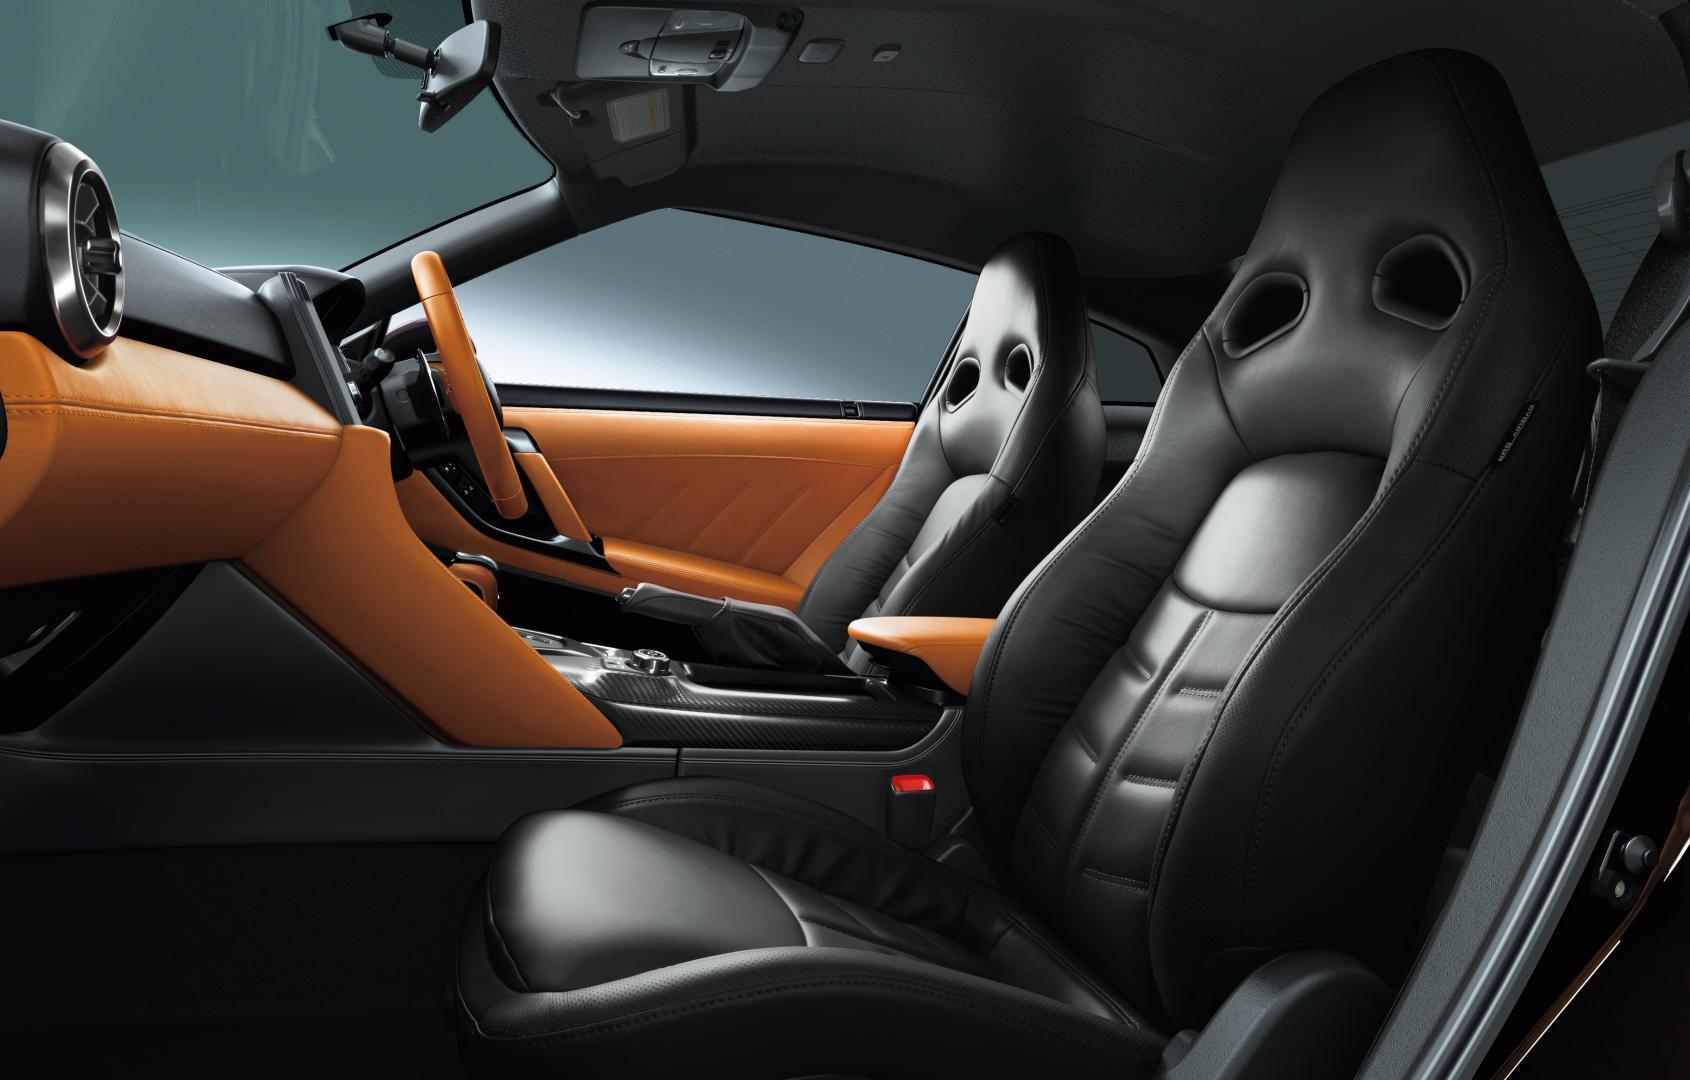 Nissan GT-R in Midnight Opal